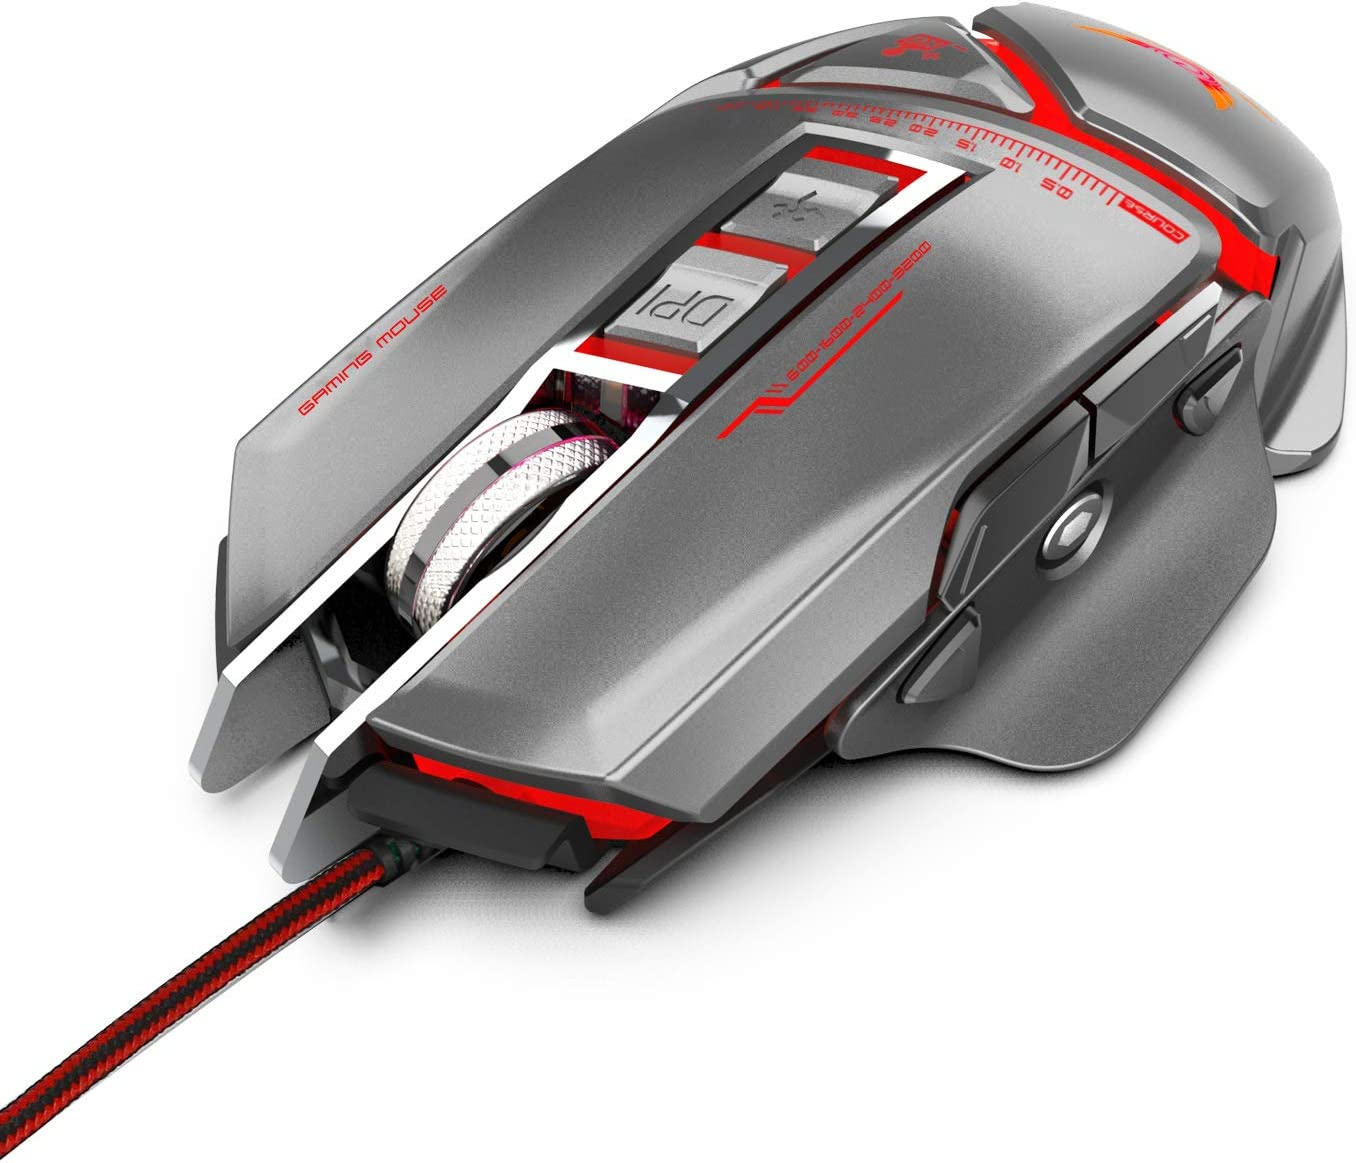 3200 DPI Breathing Light Ergonomic Game USB Computer Mice RGB Gamer Desktop Laptop PC Gaming Mouse,Black Programmable Gaming Mouse Wired